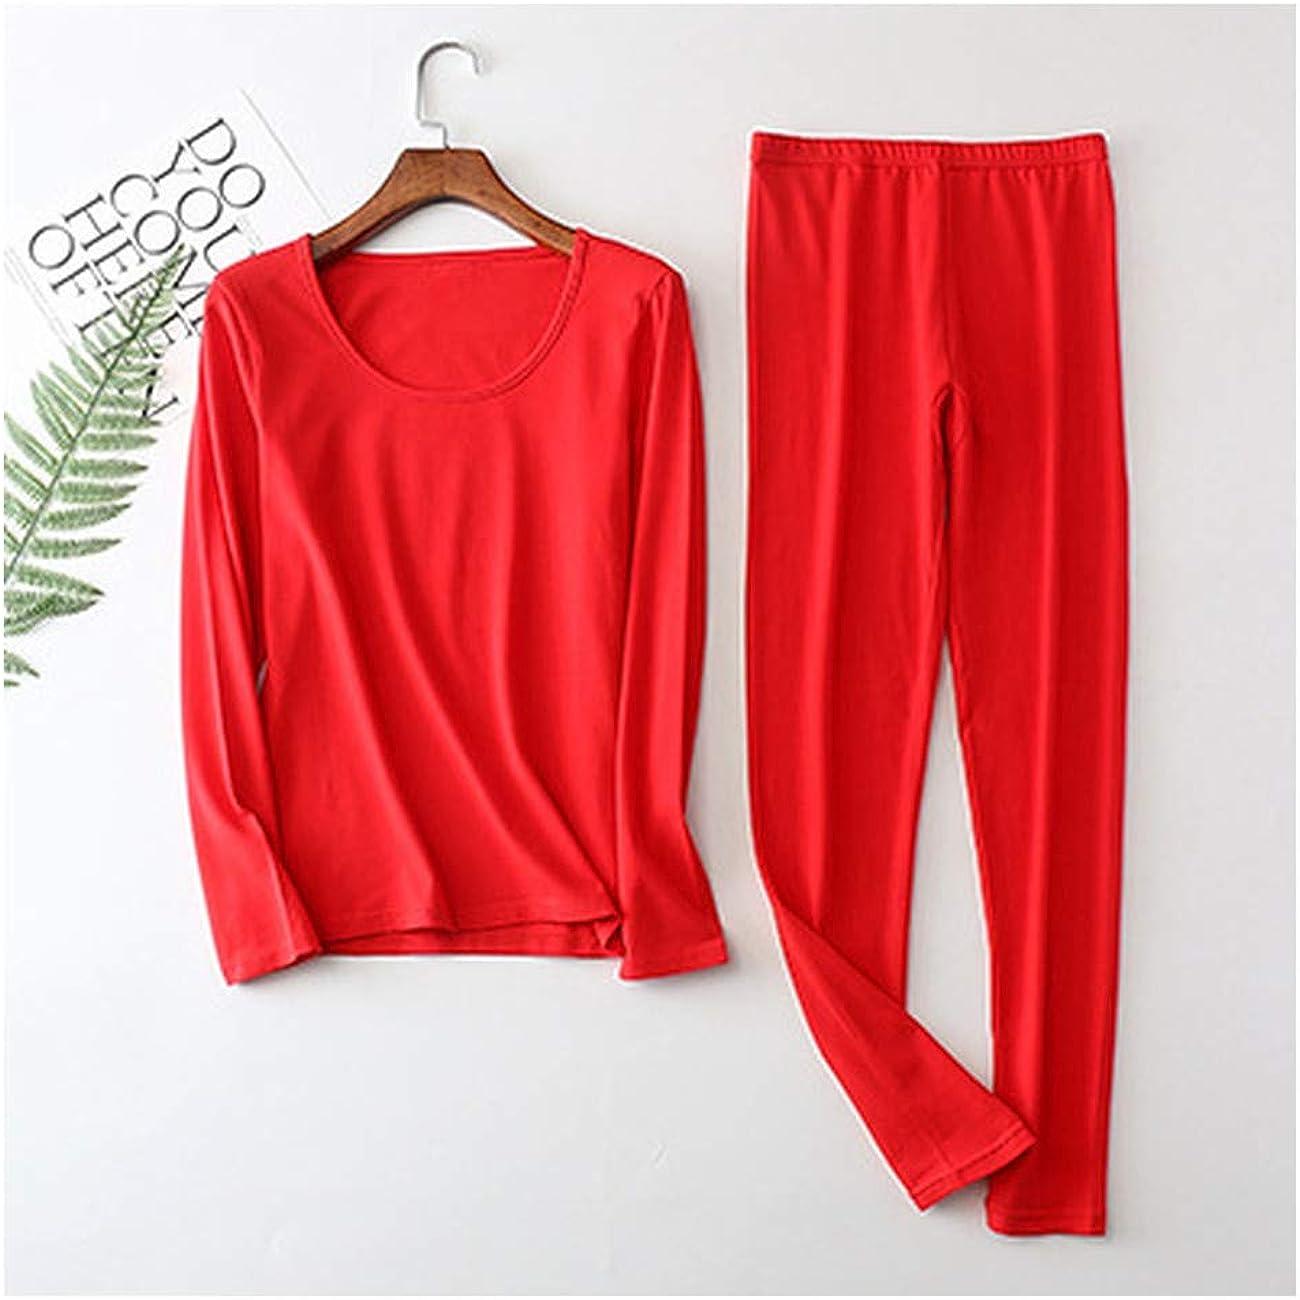 Fancy Dawn Women Plus Large Big Size Cotton Thermal Underwear Set Long Top and Bottoms